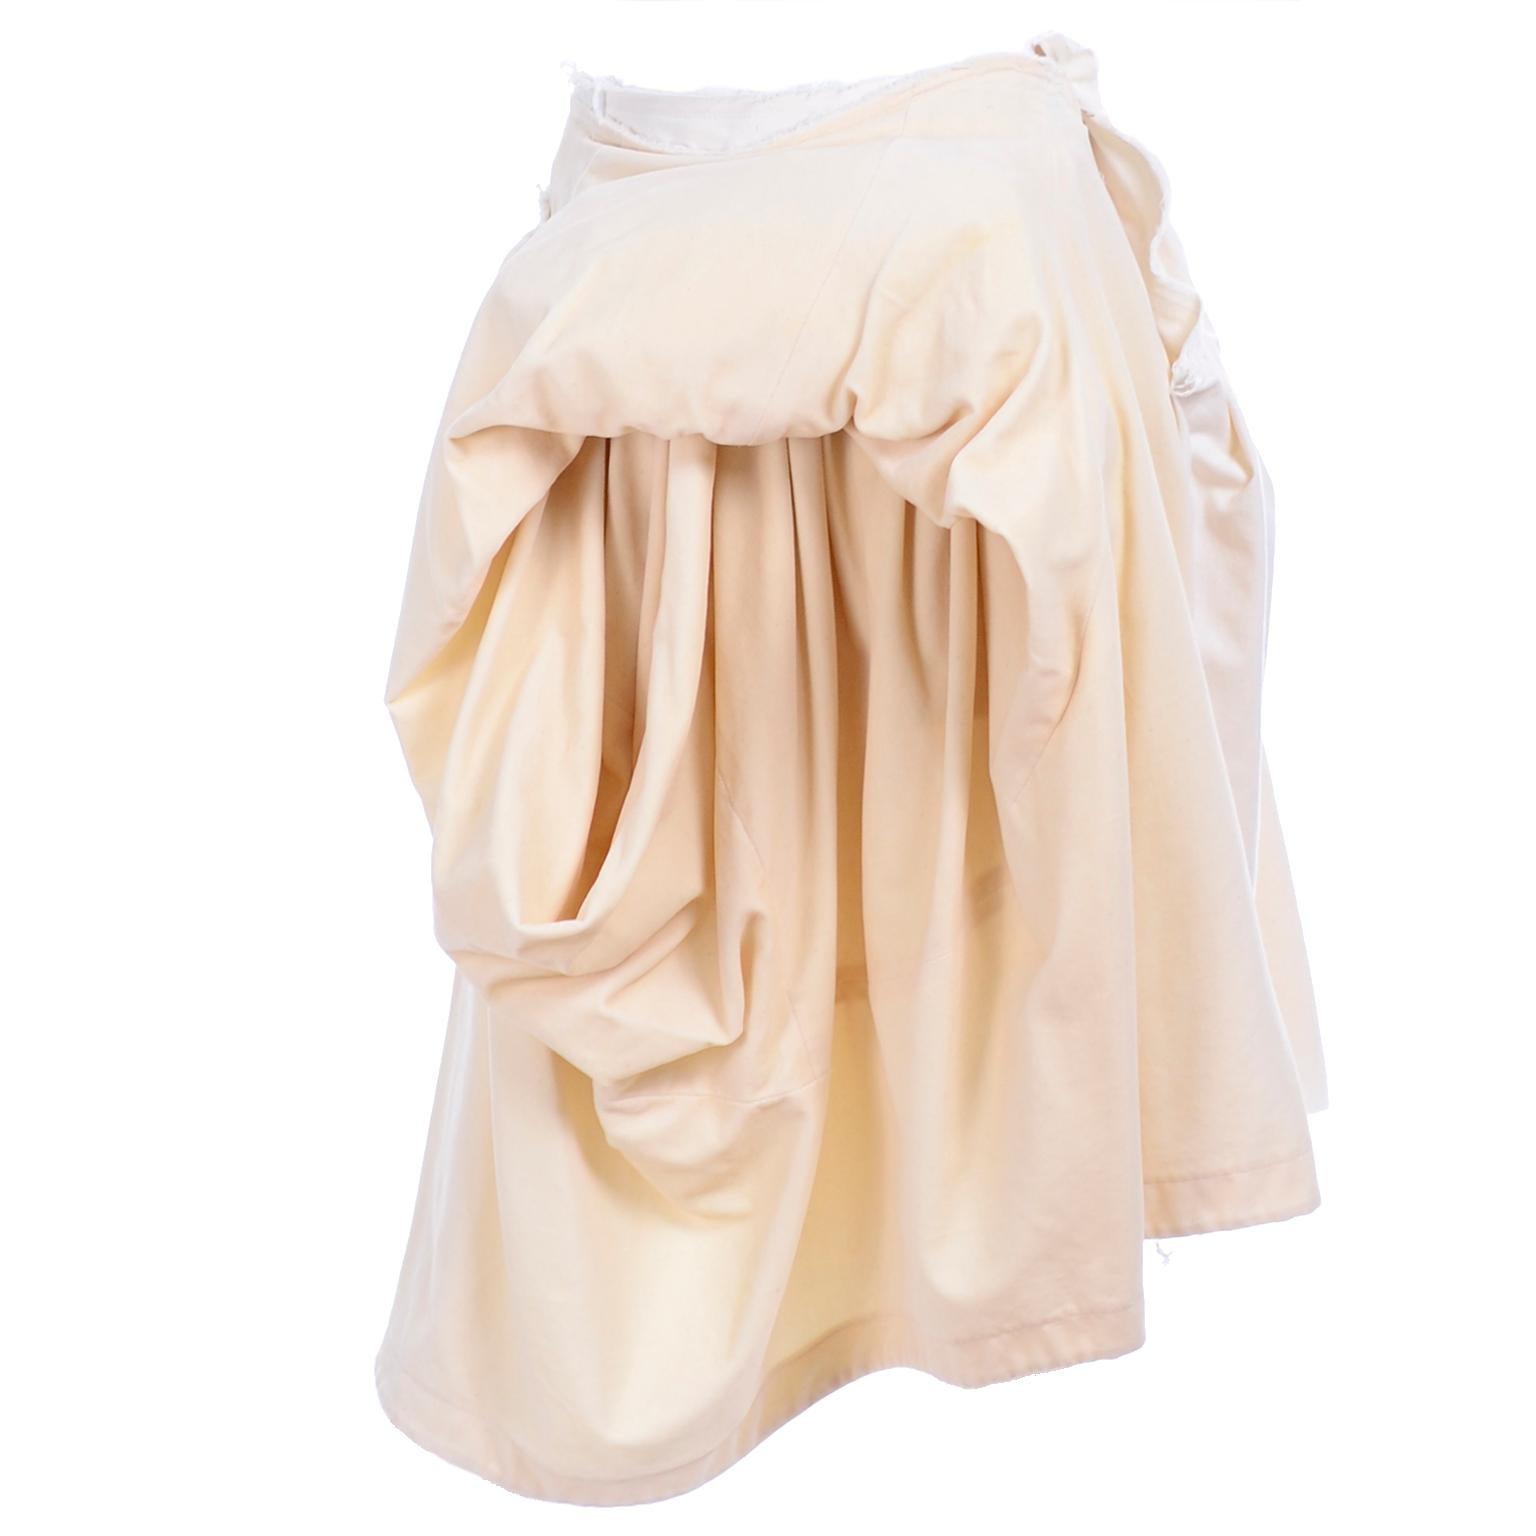 fe4491908d7e 2003 Comme des Garcons Toile Pattern Bondage Skirt For Sale at 1stdibs